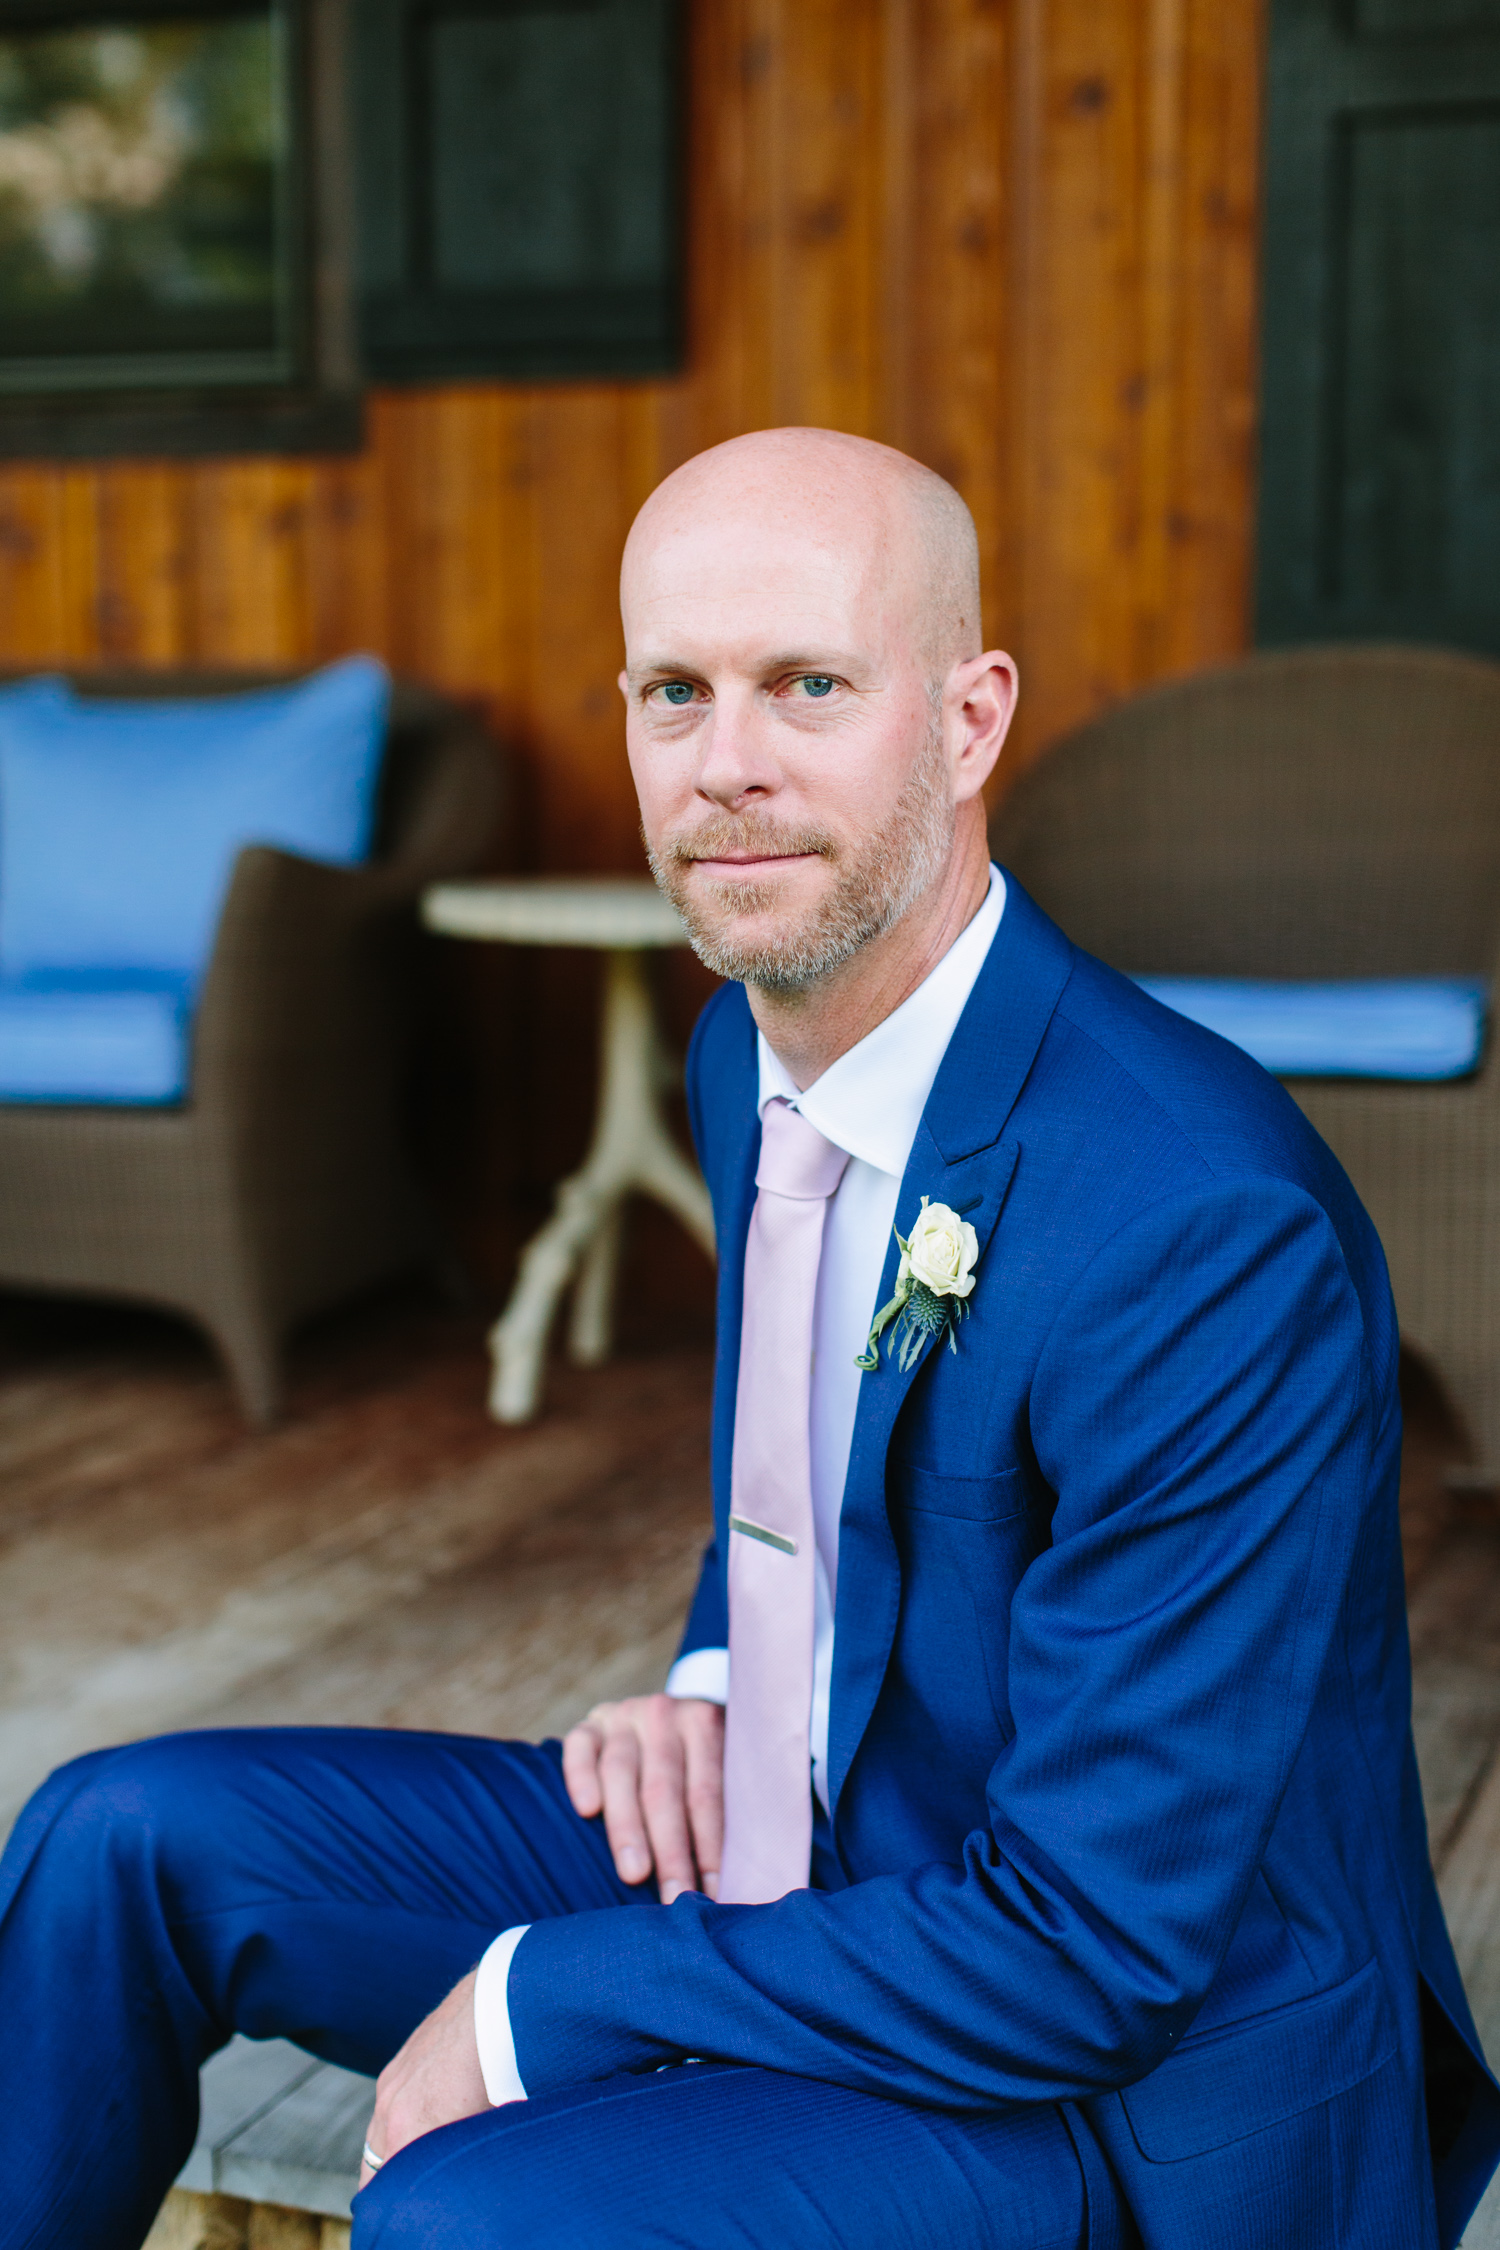 Groom Portraits Romantic Pavilion Wedding // Tennessee Photographer // Suzy Collins Photography // The Olde Farm